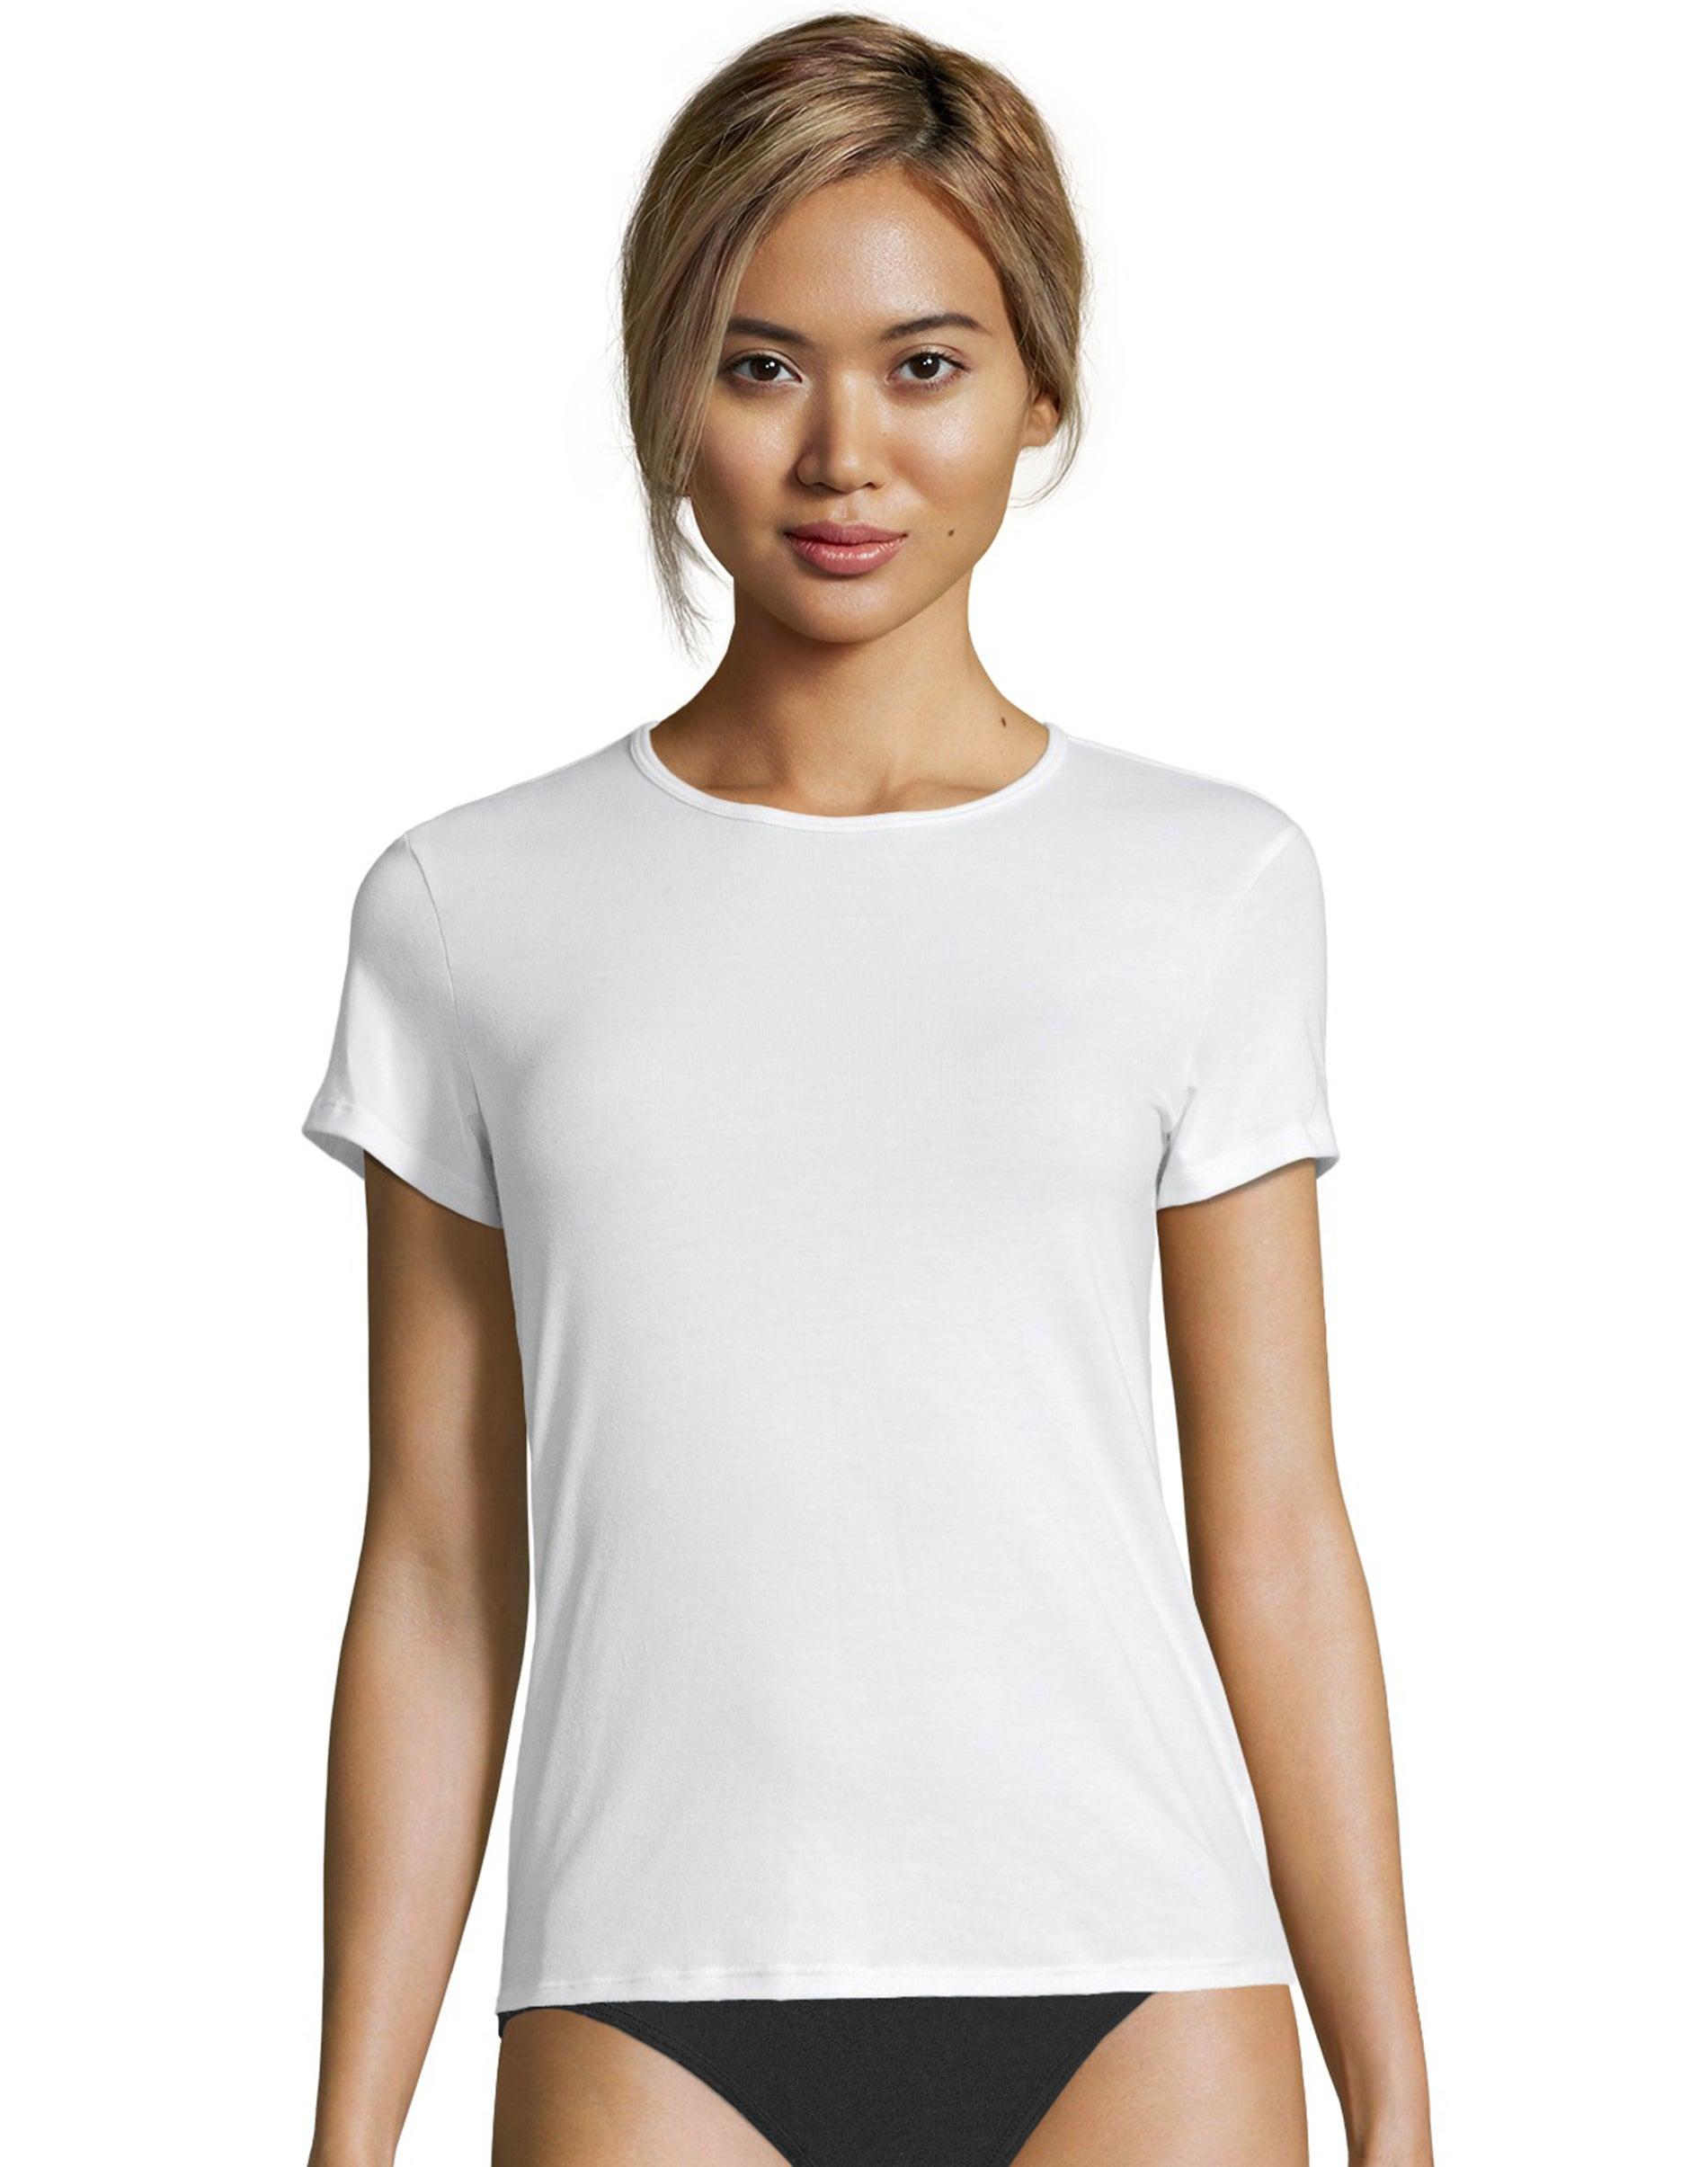 Pack of 2 Hanes Girls Jersey Cotton Tee Shirt